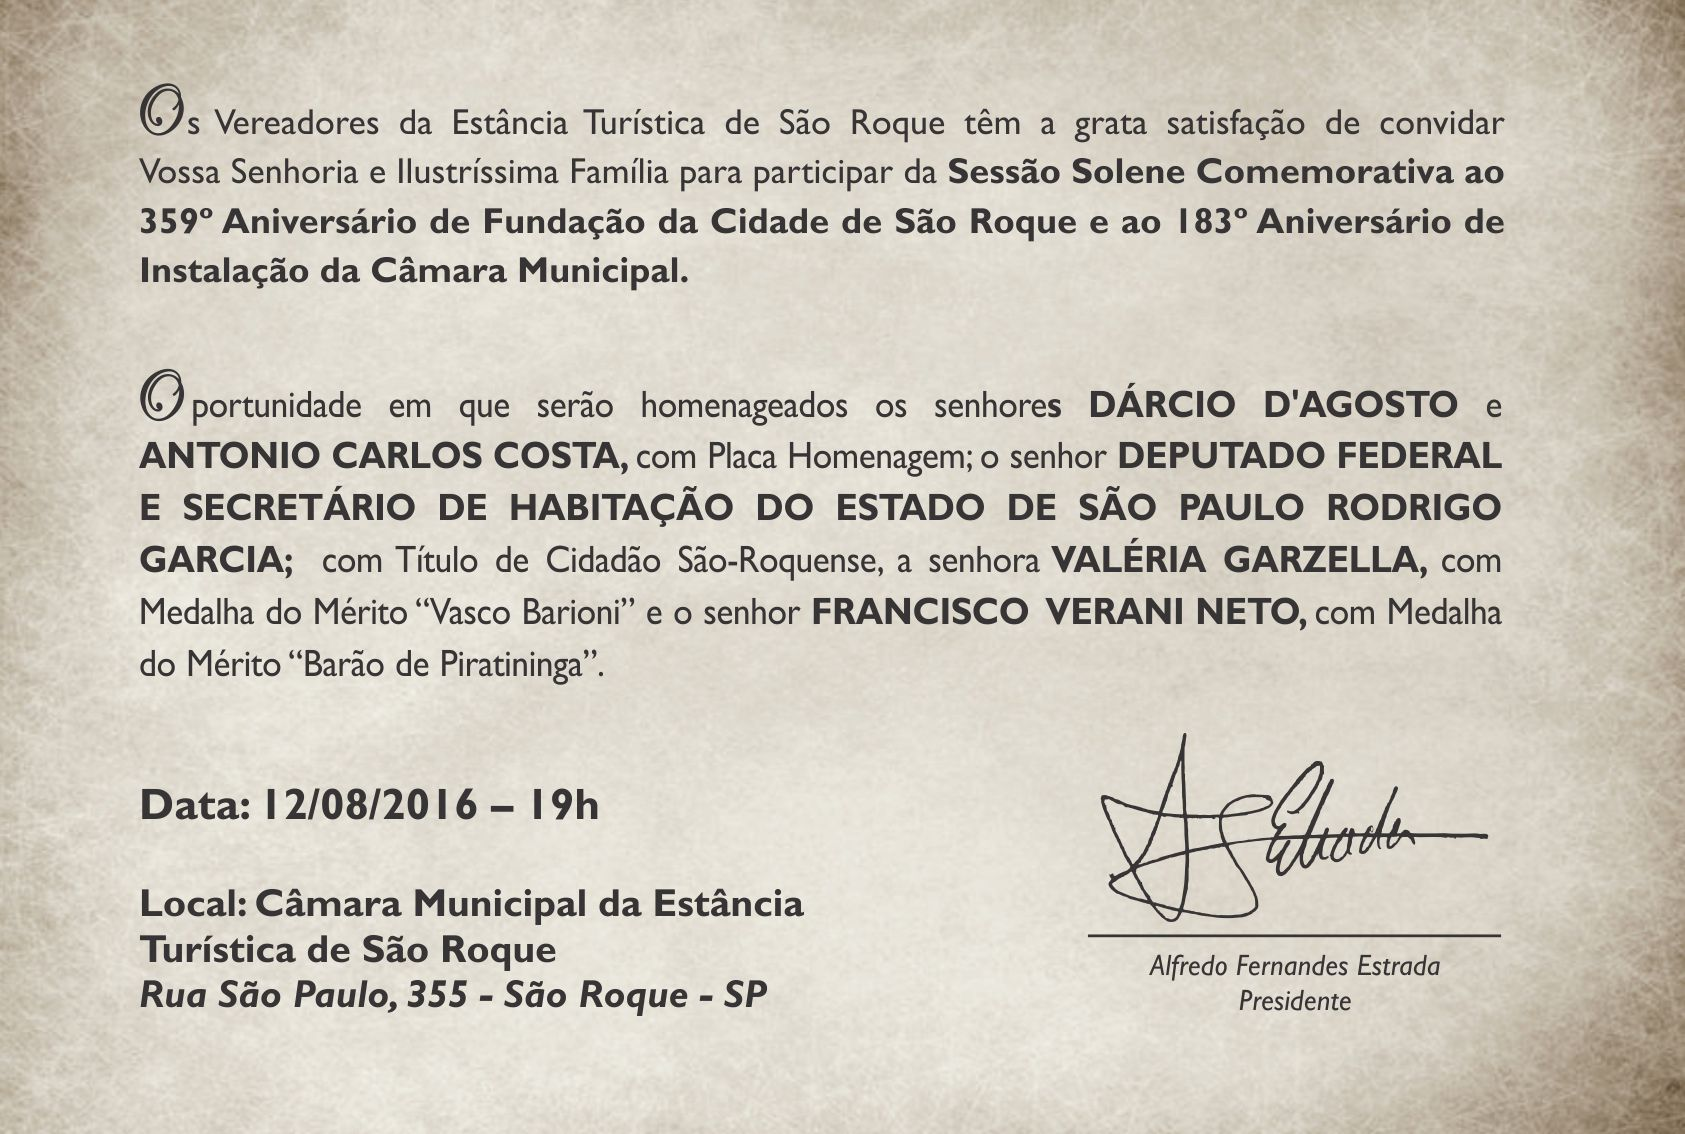 Convite - Camara Municipal de Sao Roque 23